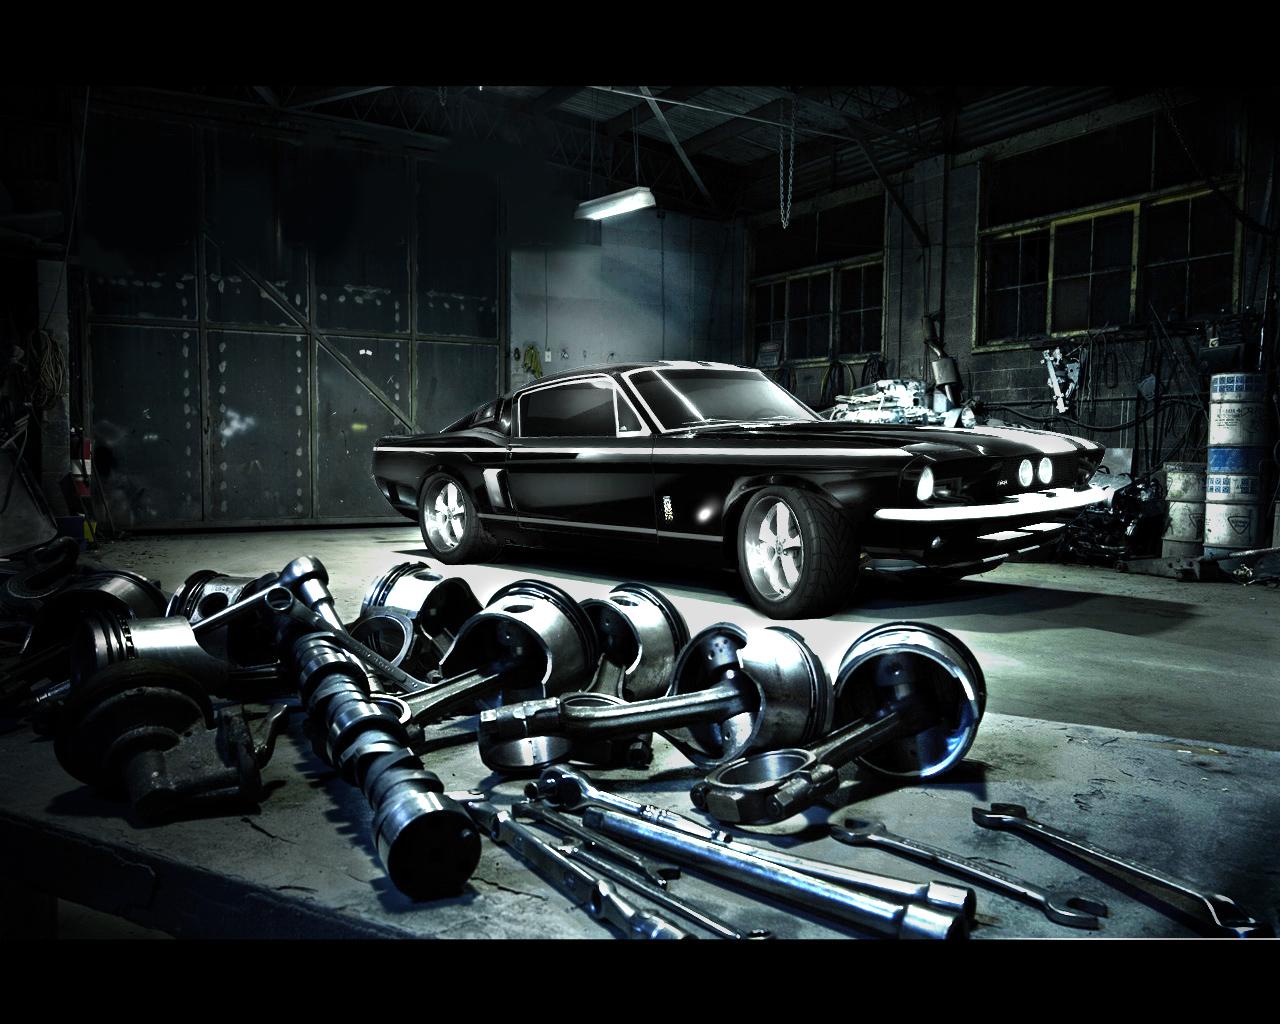 67 Shelby GT500 Wallpaper  WallpaperSafari